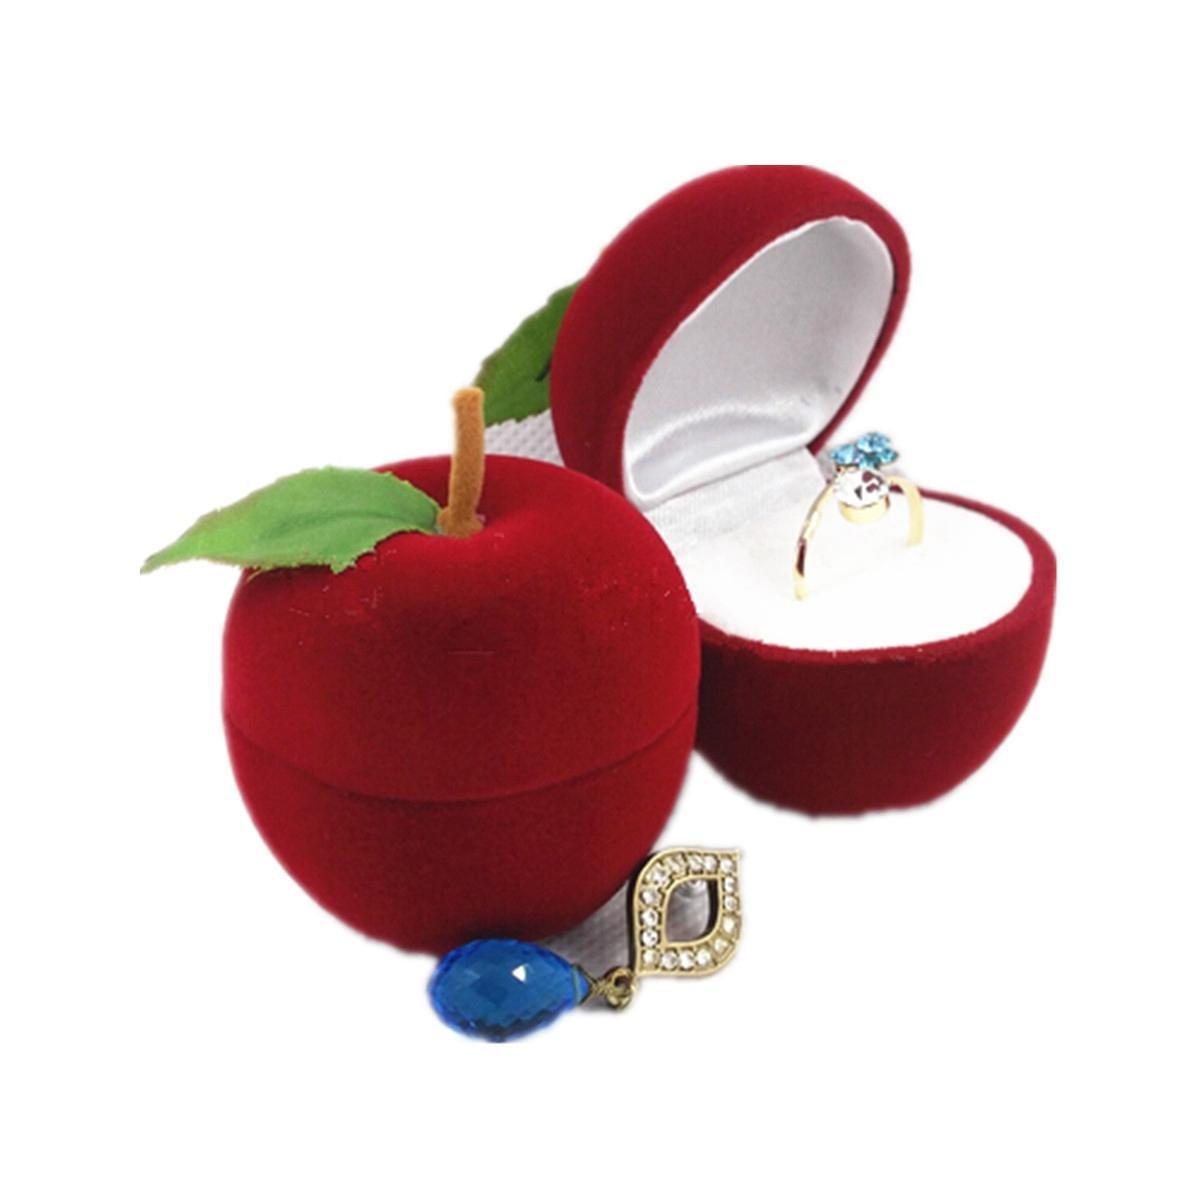 Velvet Apple Shape Ring Earrings Jewelry Display Storage Box